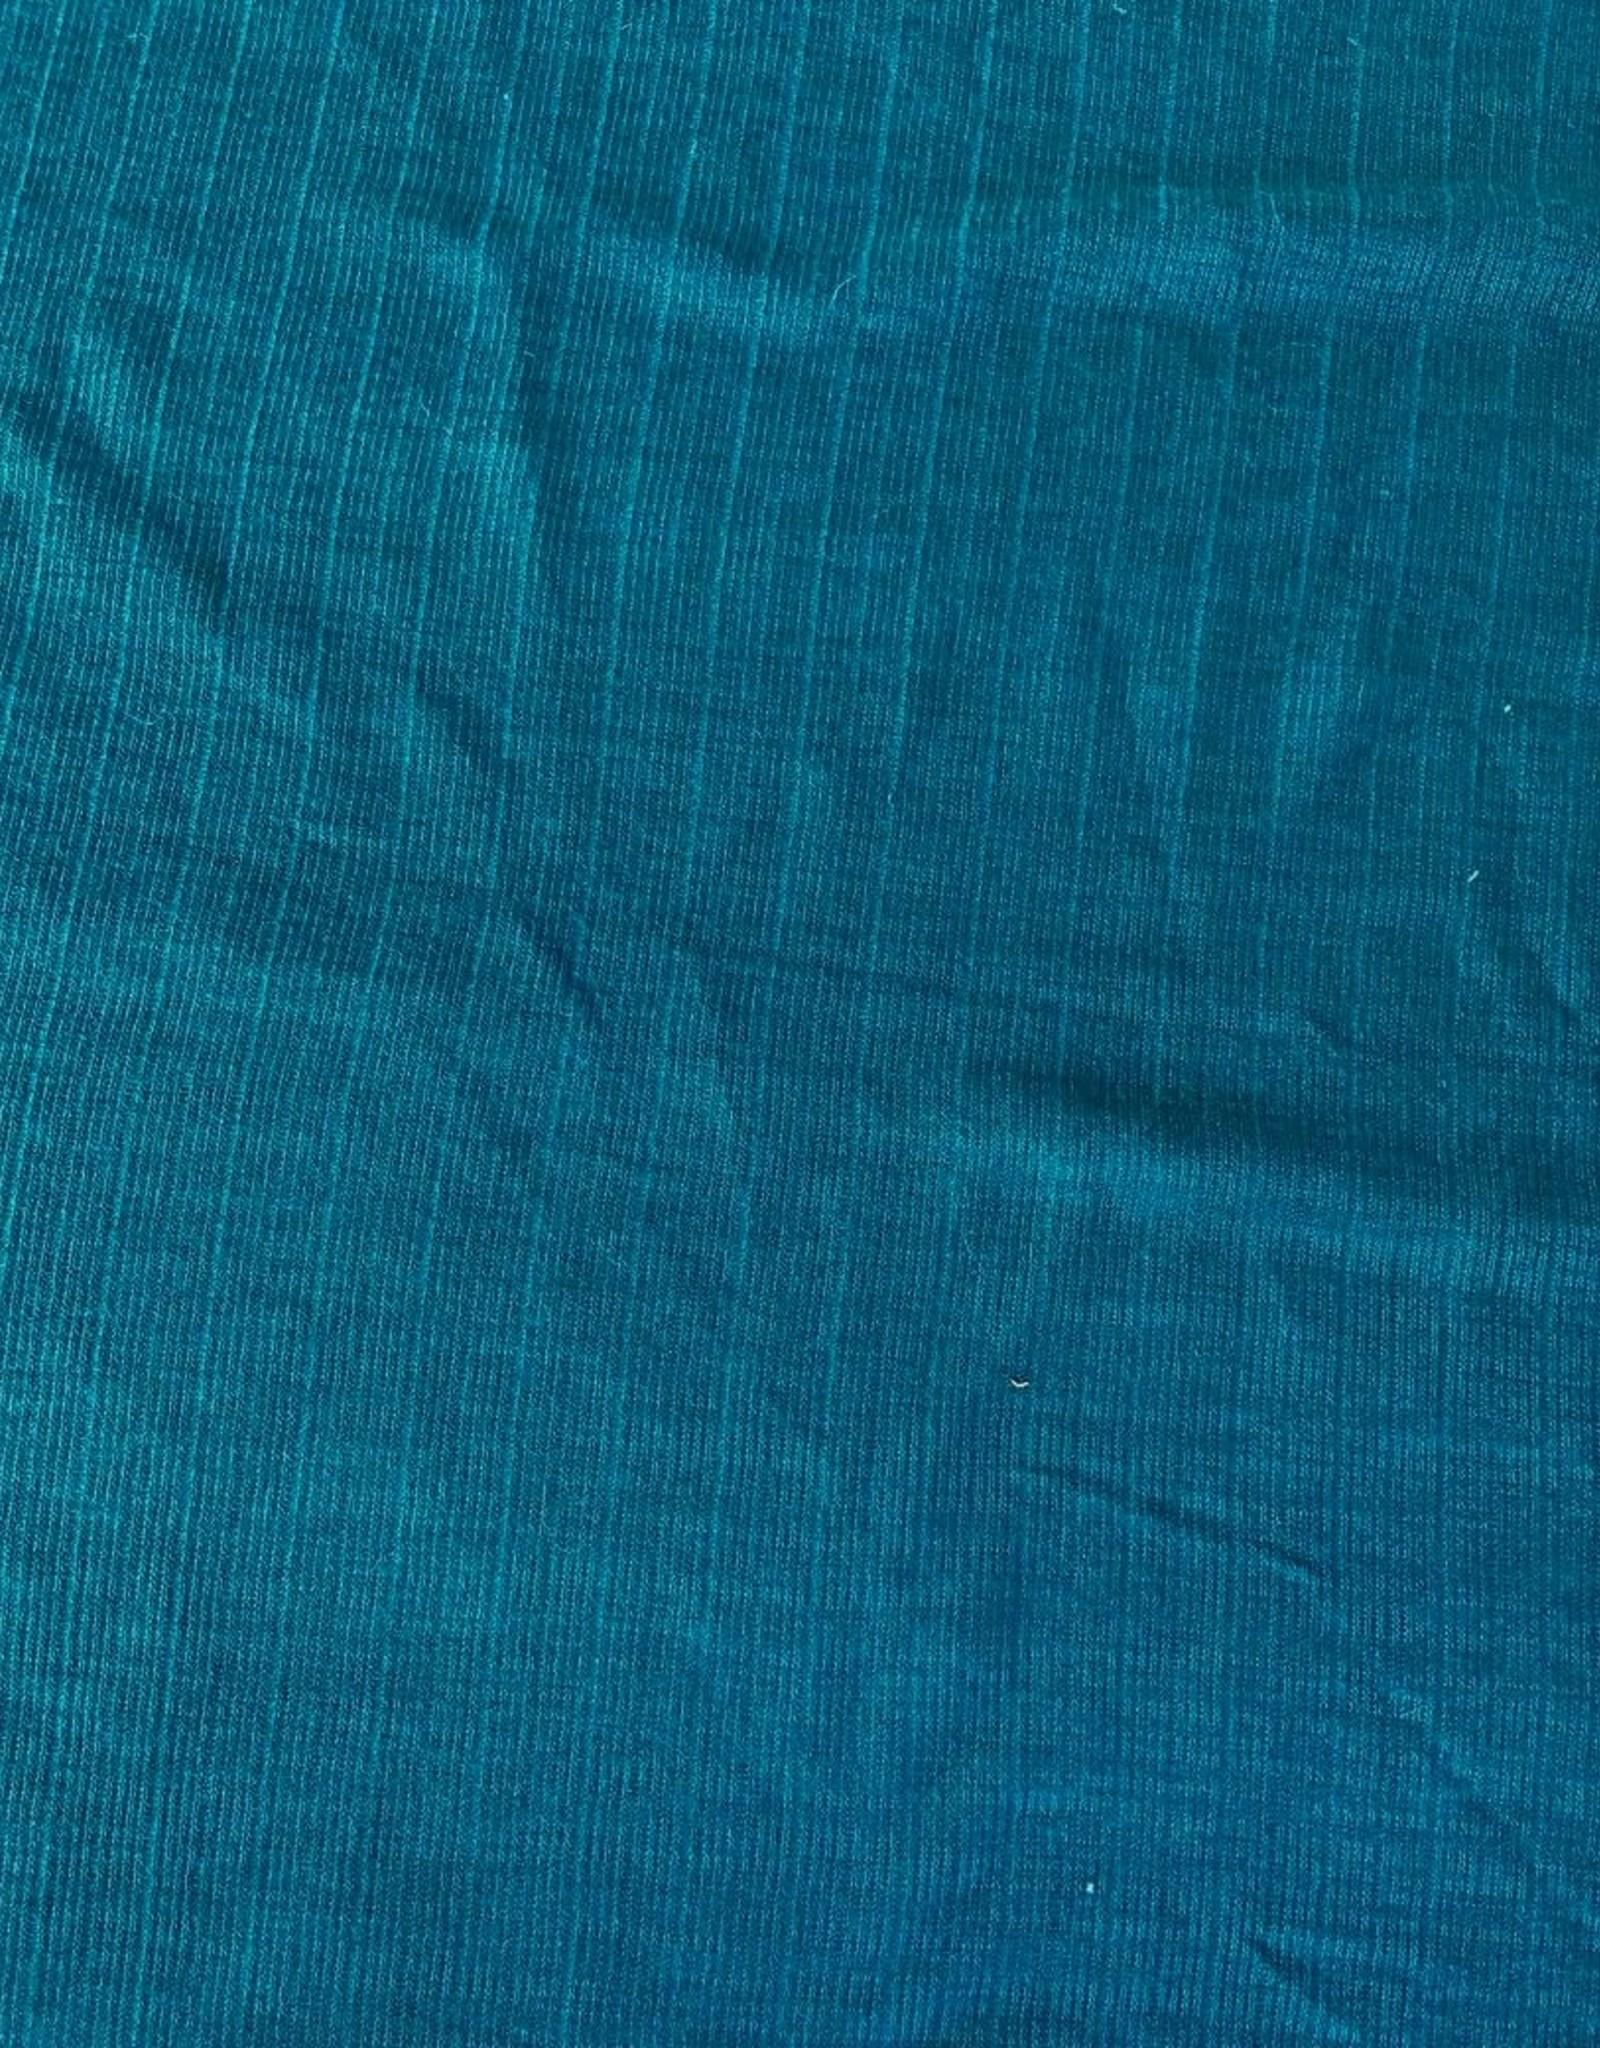 Mind The Maker Viscose knit trim green COUPON 85 cm